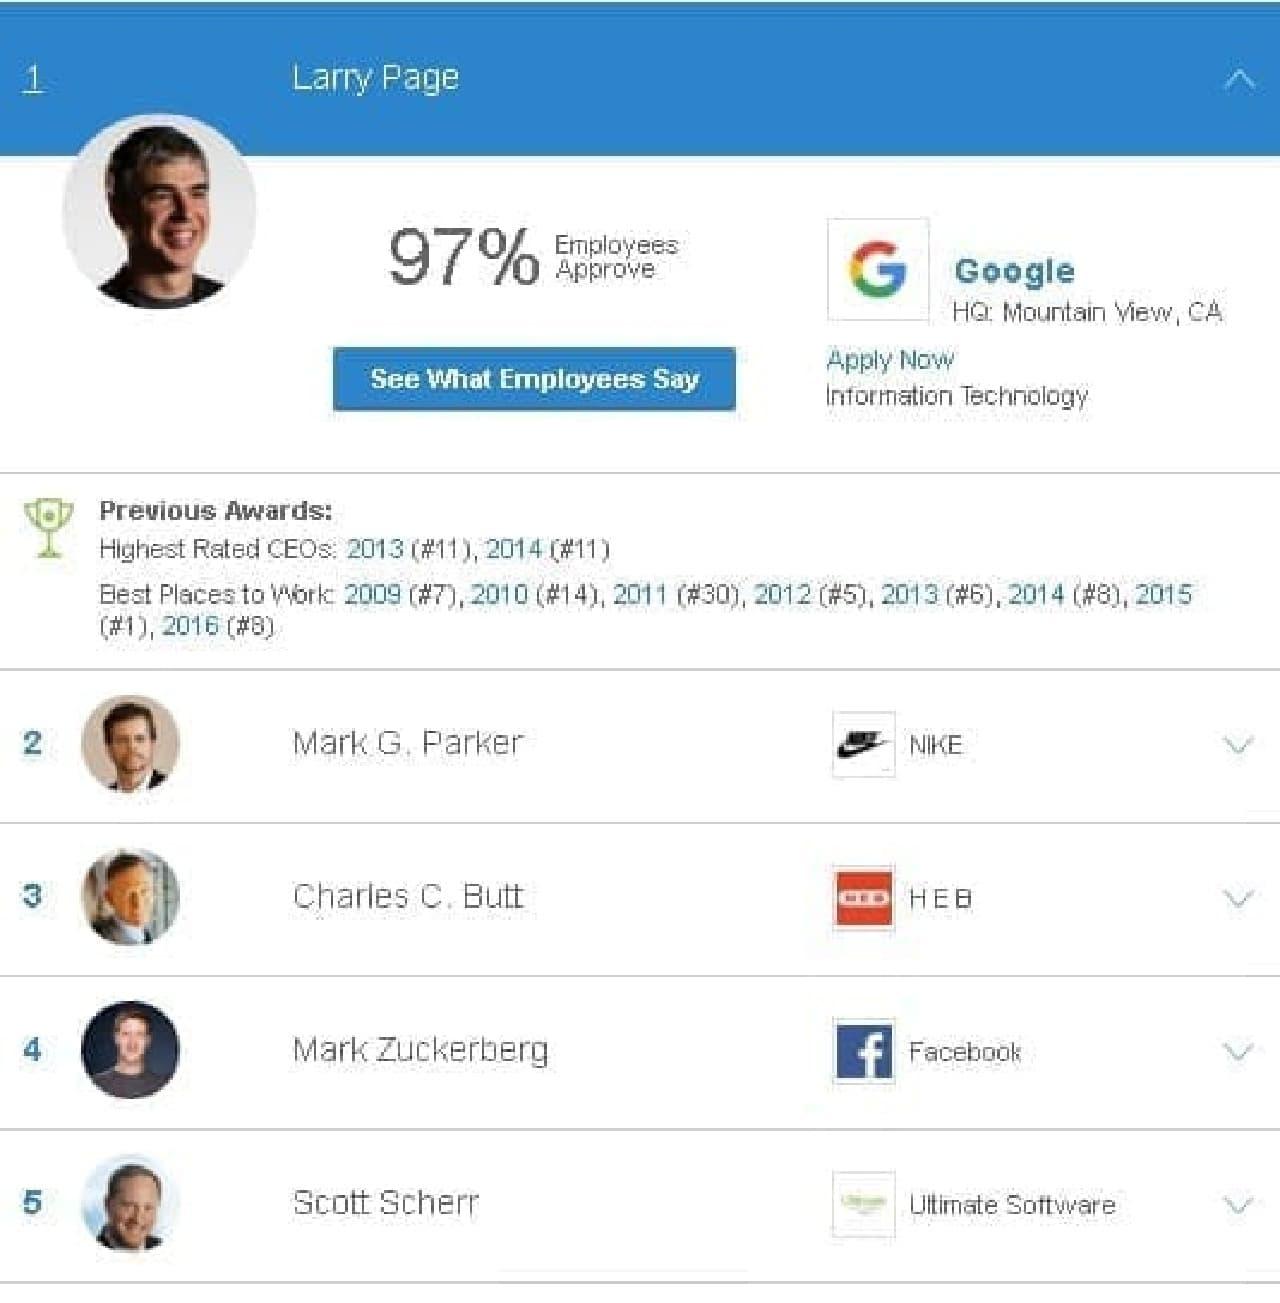 「Highest Rated CEOs 2015」ではLarry Page氏が1位だった  (画像はGlassdoorのWebサイトから)